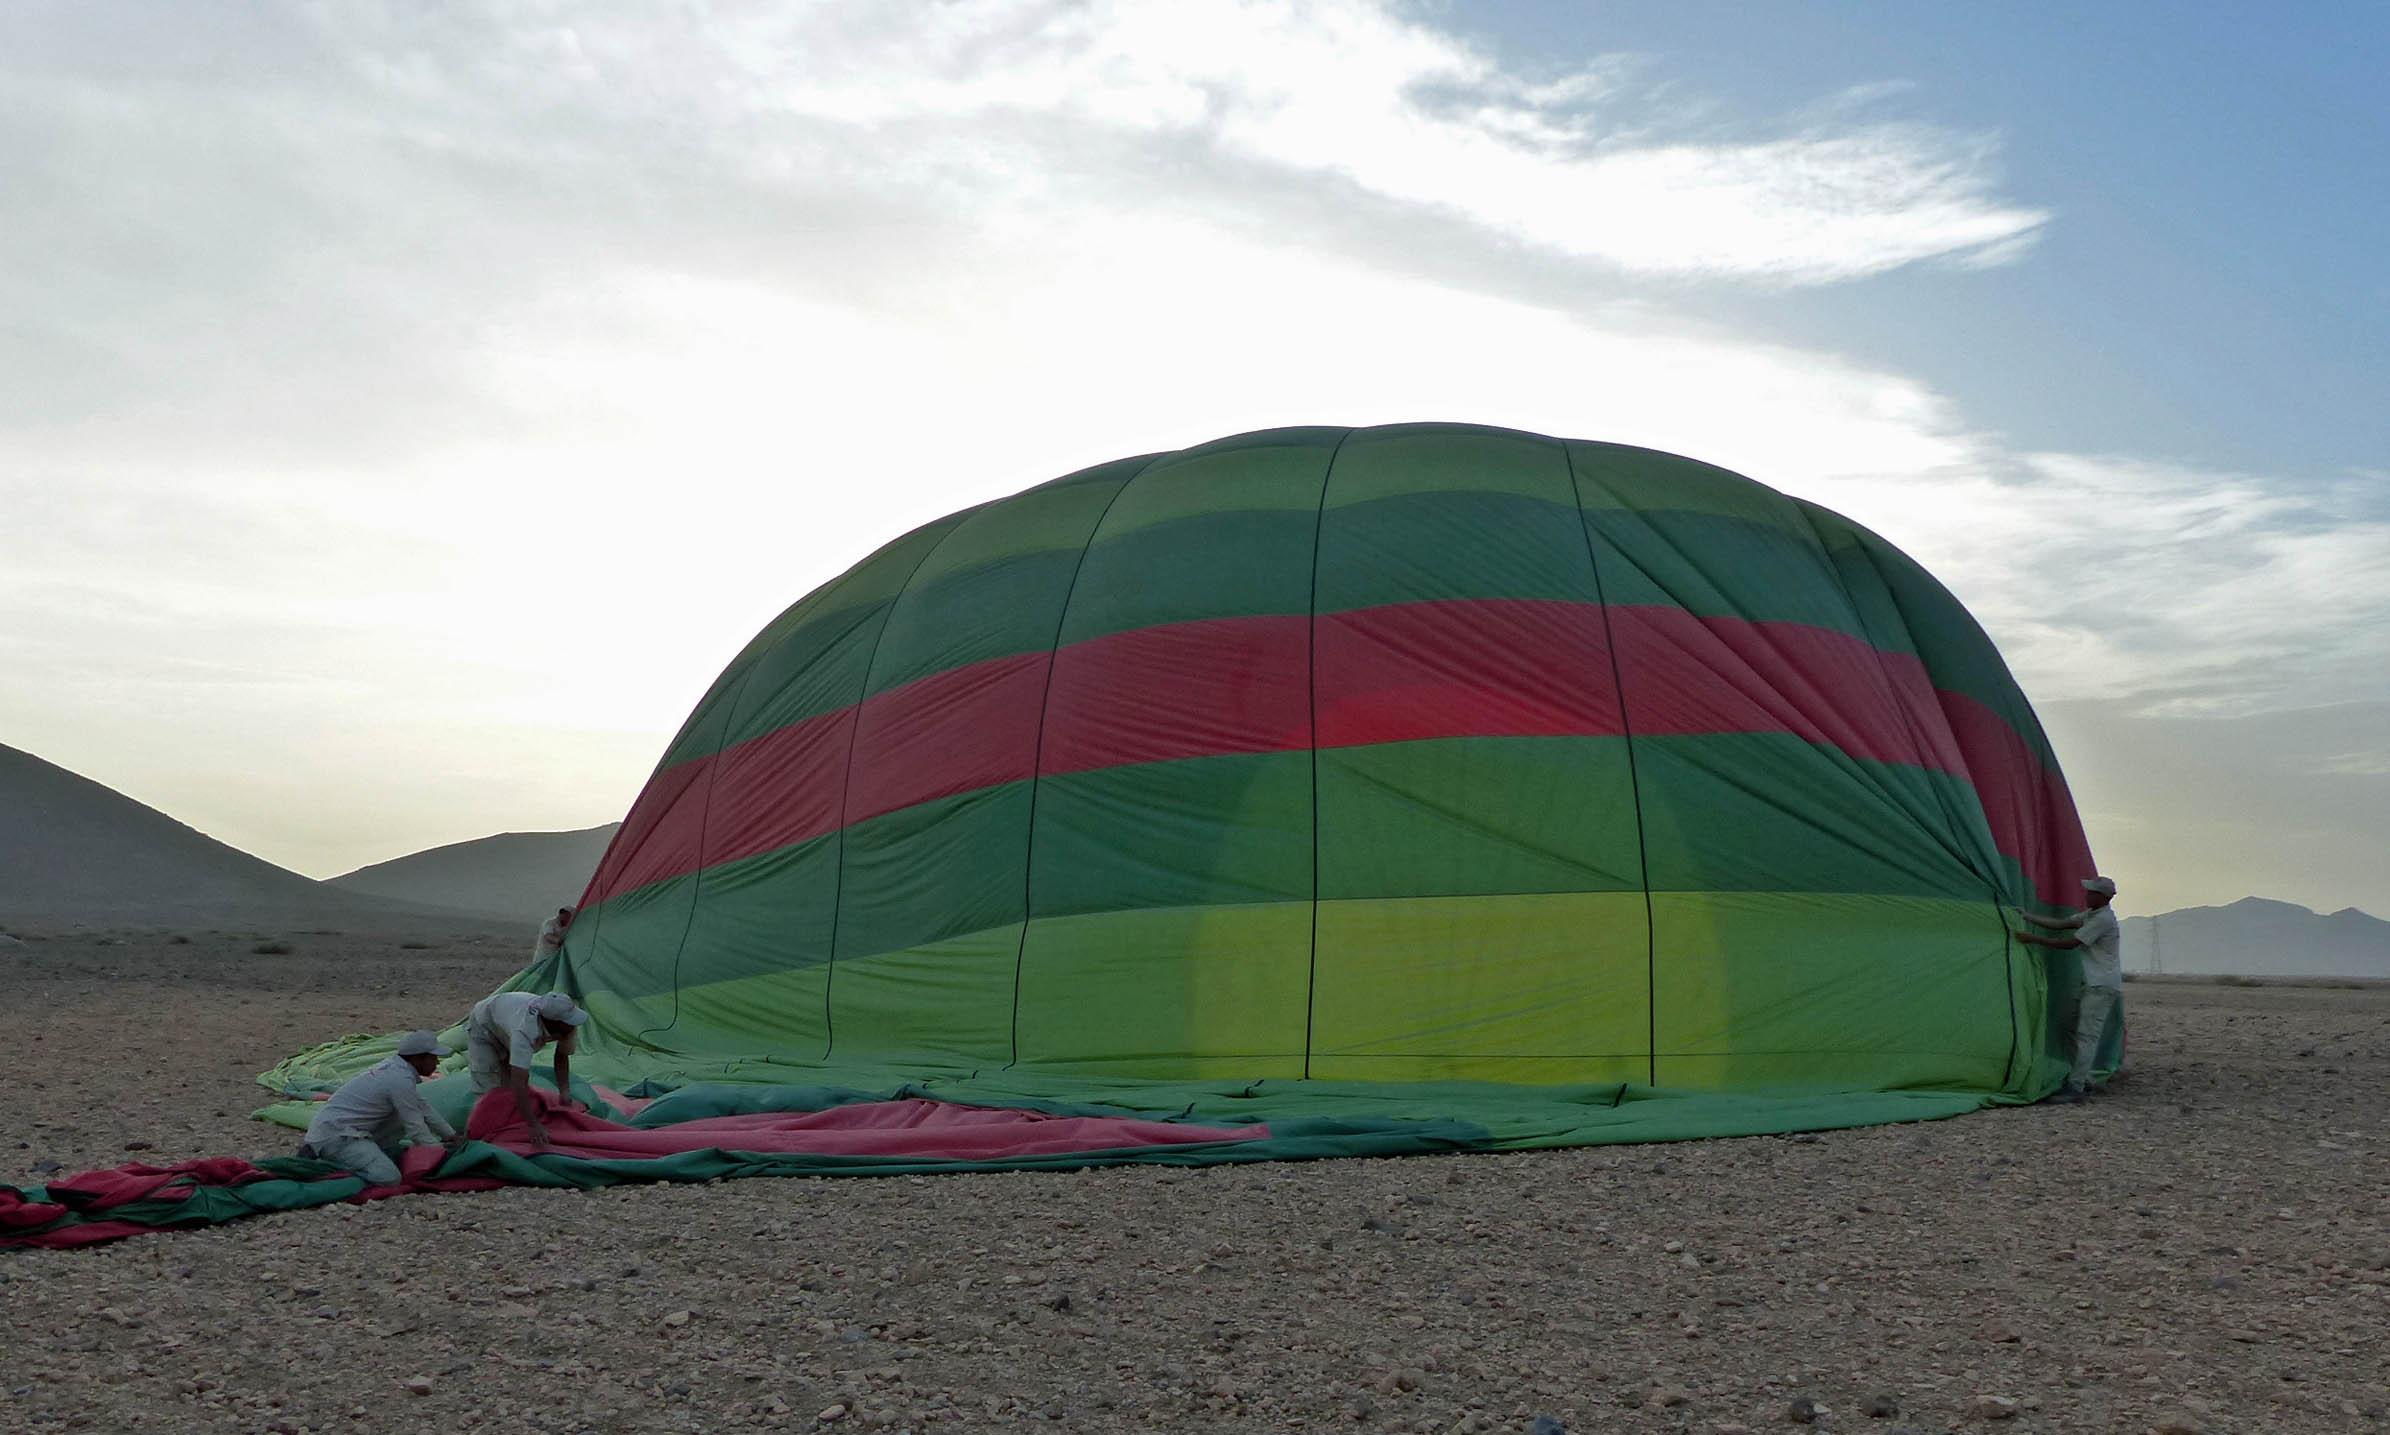 Partly deflated hot air balloon